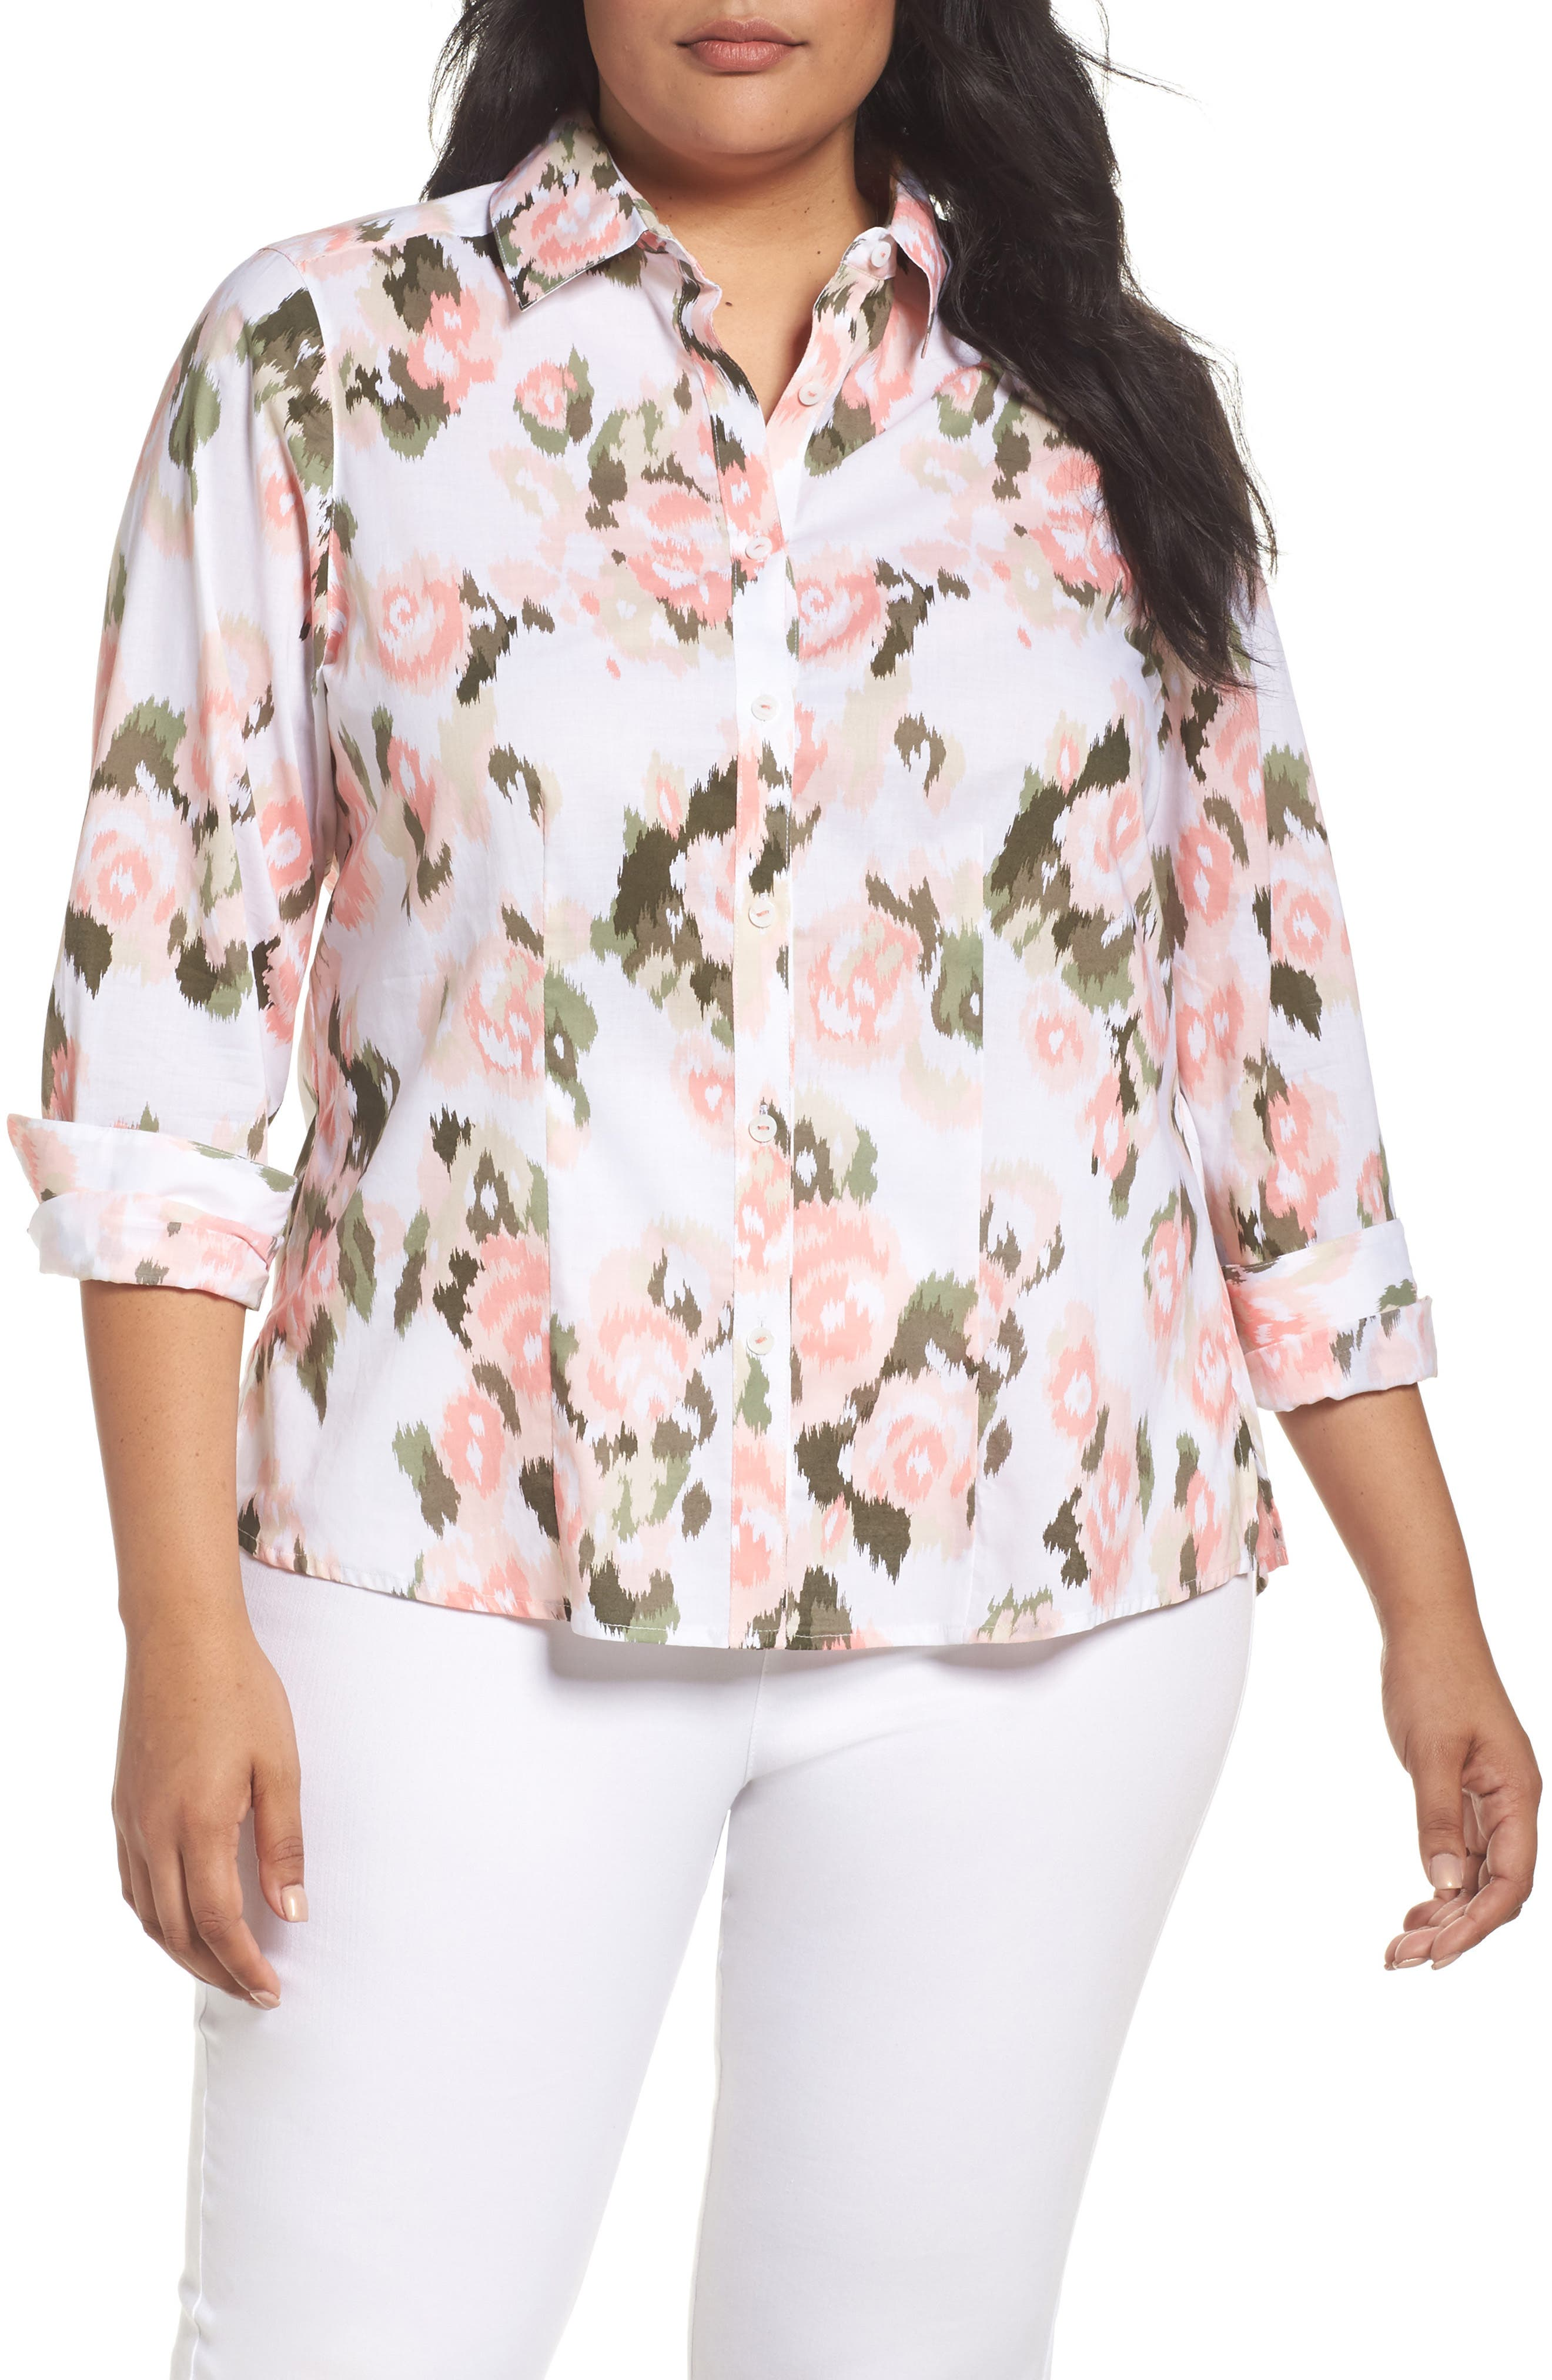 Foxcroft Brooke Floral Ikat Button Up Tunic (Plus Size)